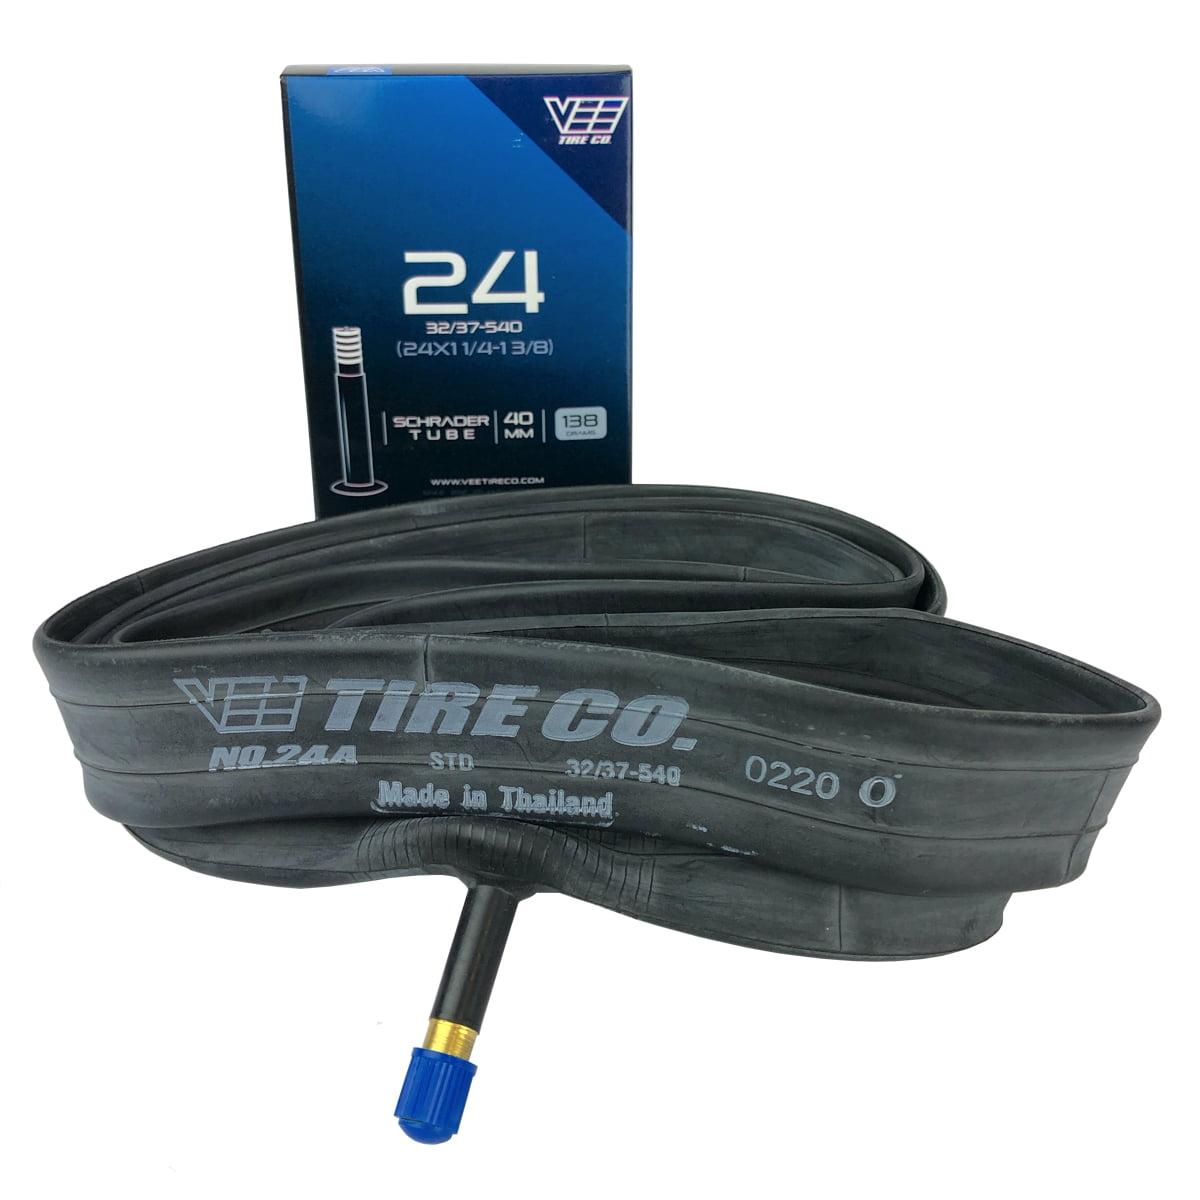 "12 x 1.75-2.25/"" Bicycle Tube Schrader Valve 4 Pack"